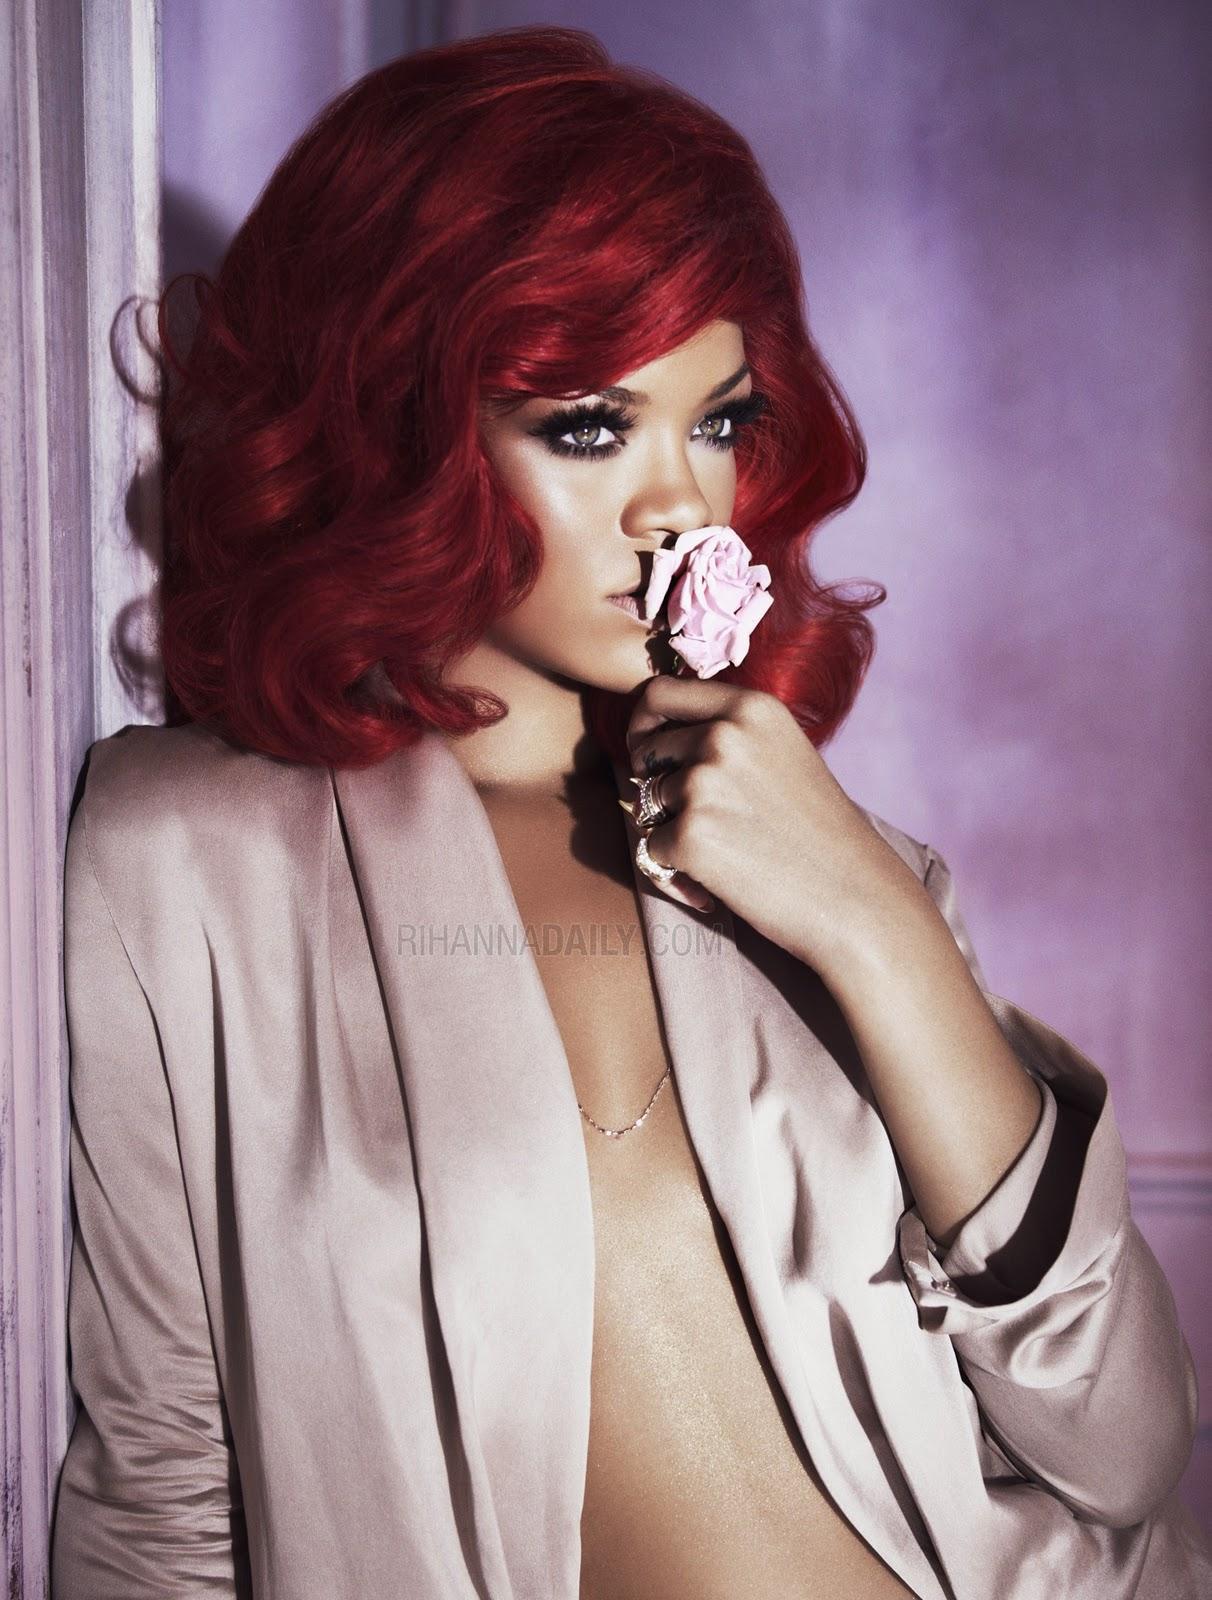 http://2.bp.blogspot.com/_EbSlokxNmbo/TSomWQChI4I/AAAAAAAAE6U/xO5RephHEPM/s1600/Reb-L-Fleur-Perfume-rihanna-17894022-1875-2500.jpg